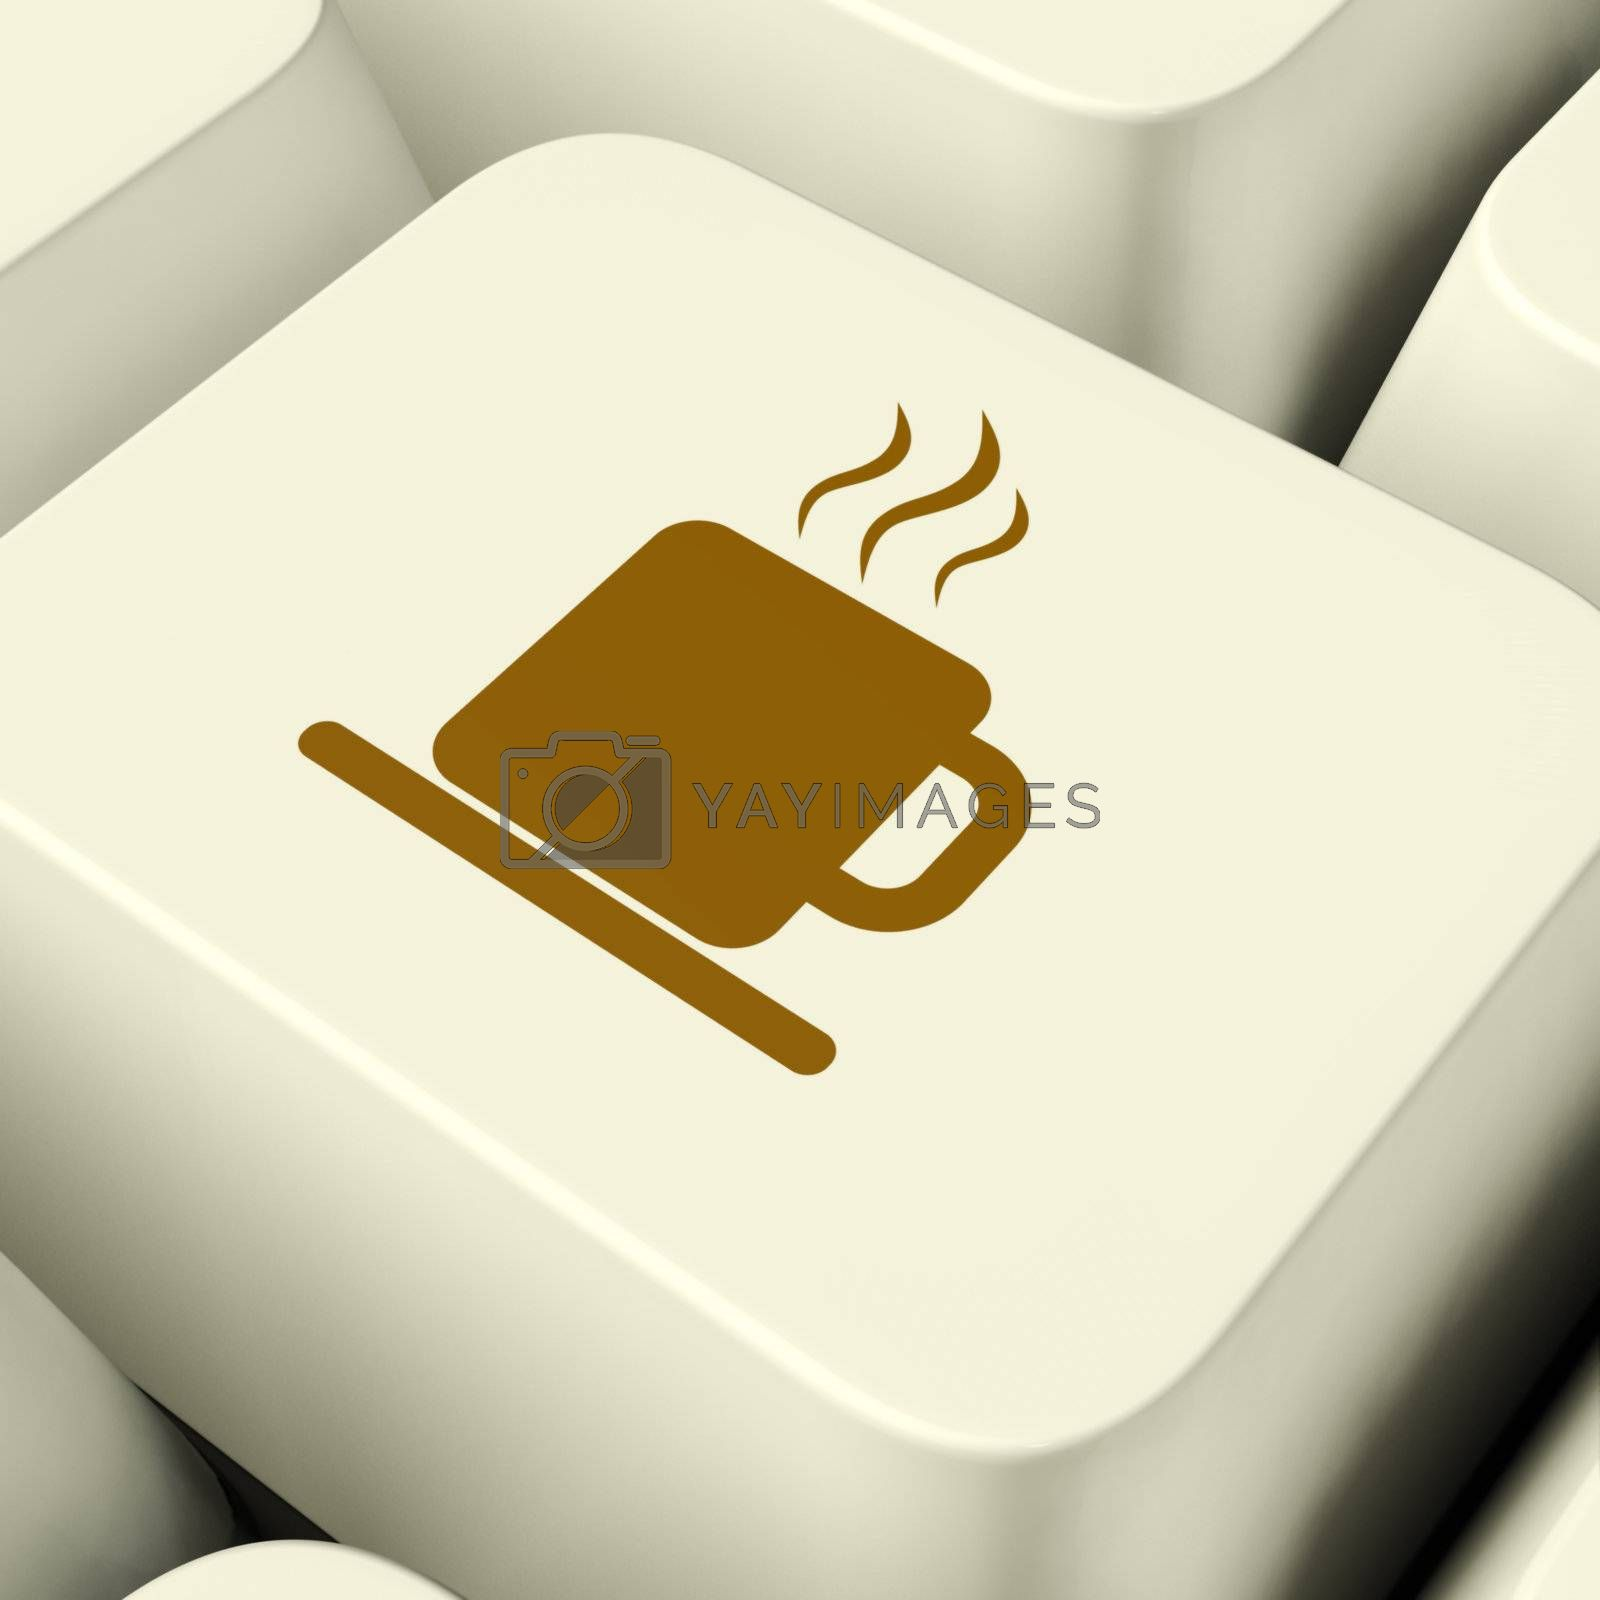 Coffee Mug Icon Computer White Key For Taking A Break